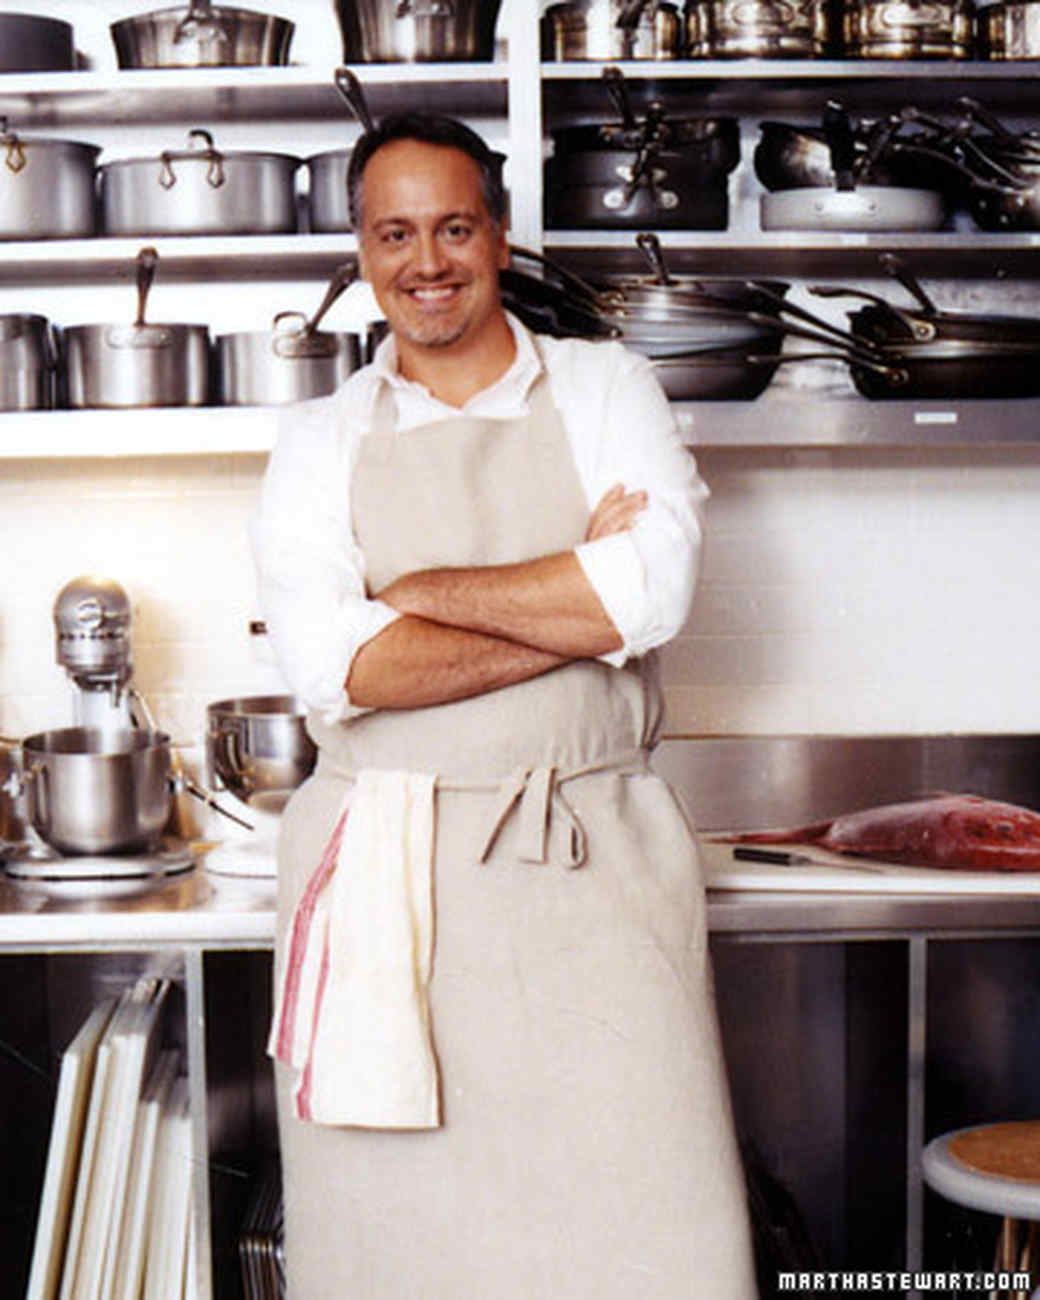 la1026063_1106_chefs.jpg